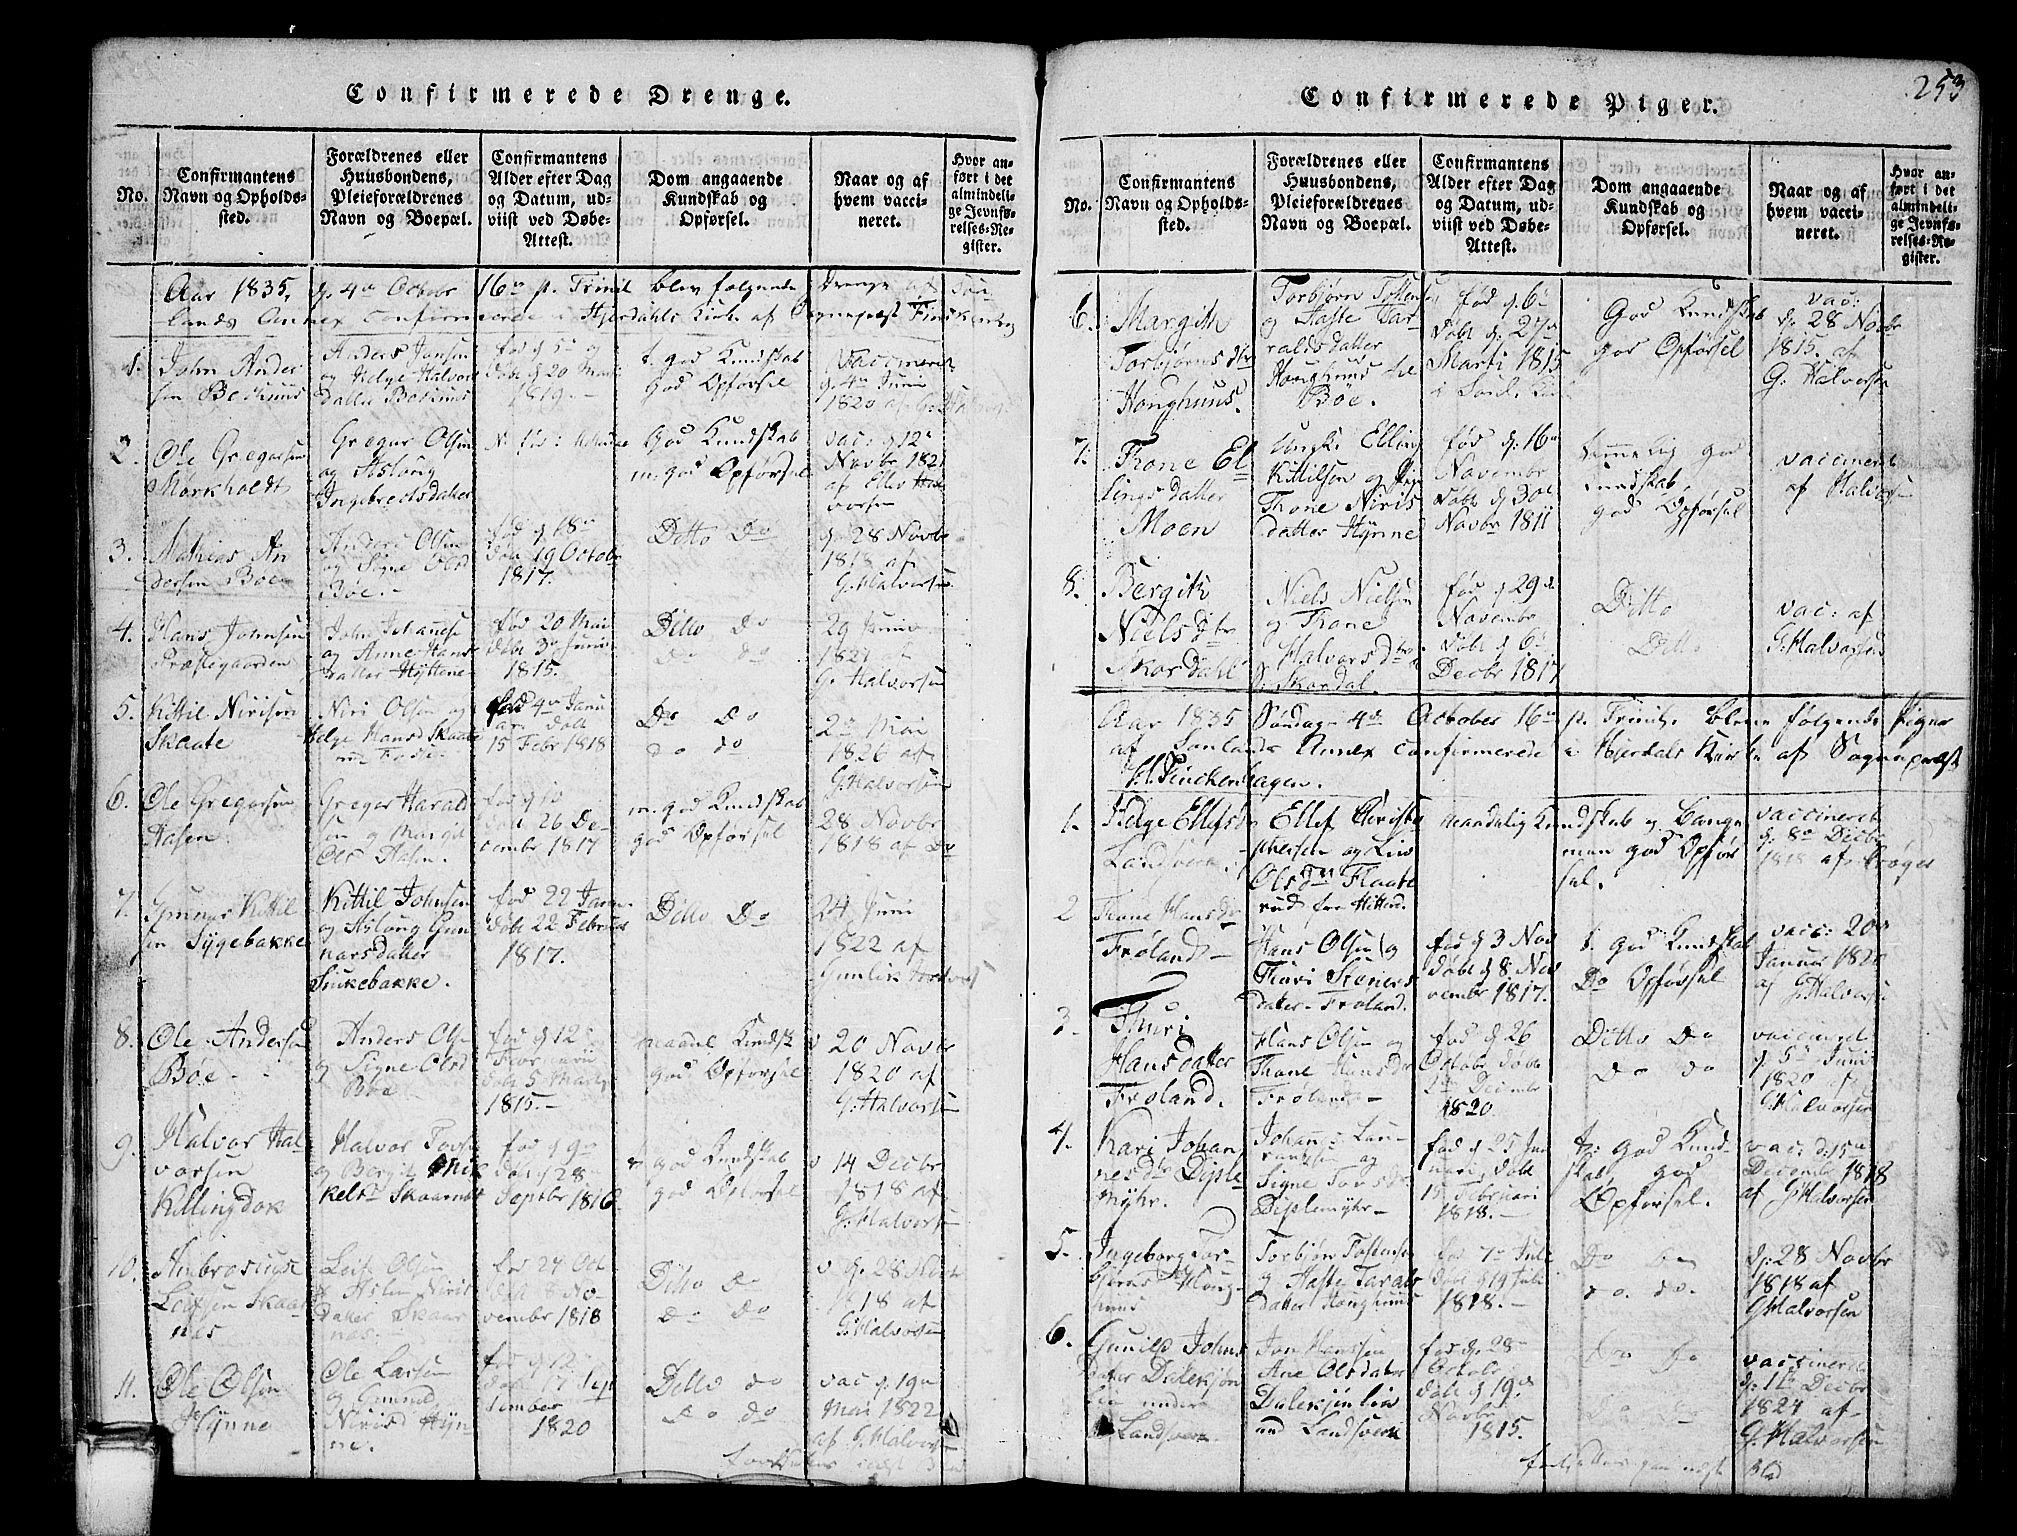 SAKO, Hjartdal kirkebøker, G/Gb/L0001: Klokkerbok nr. II 1, 1815-1842, s. 253